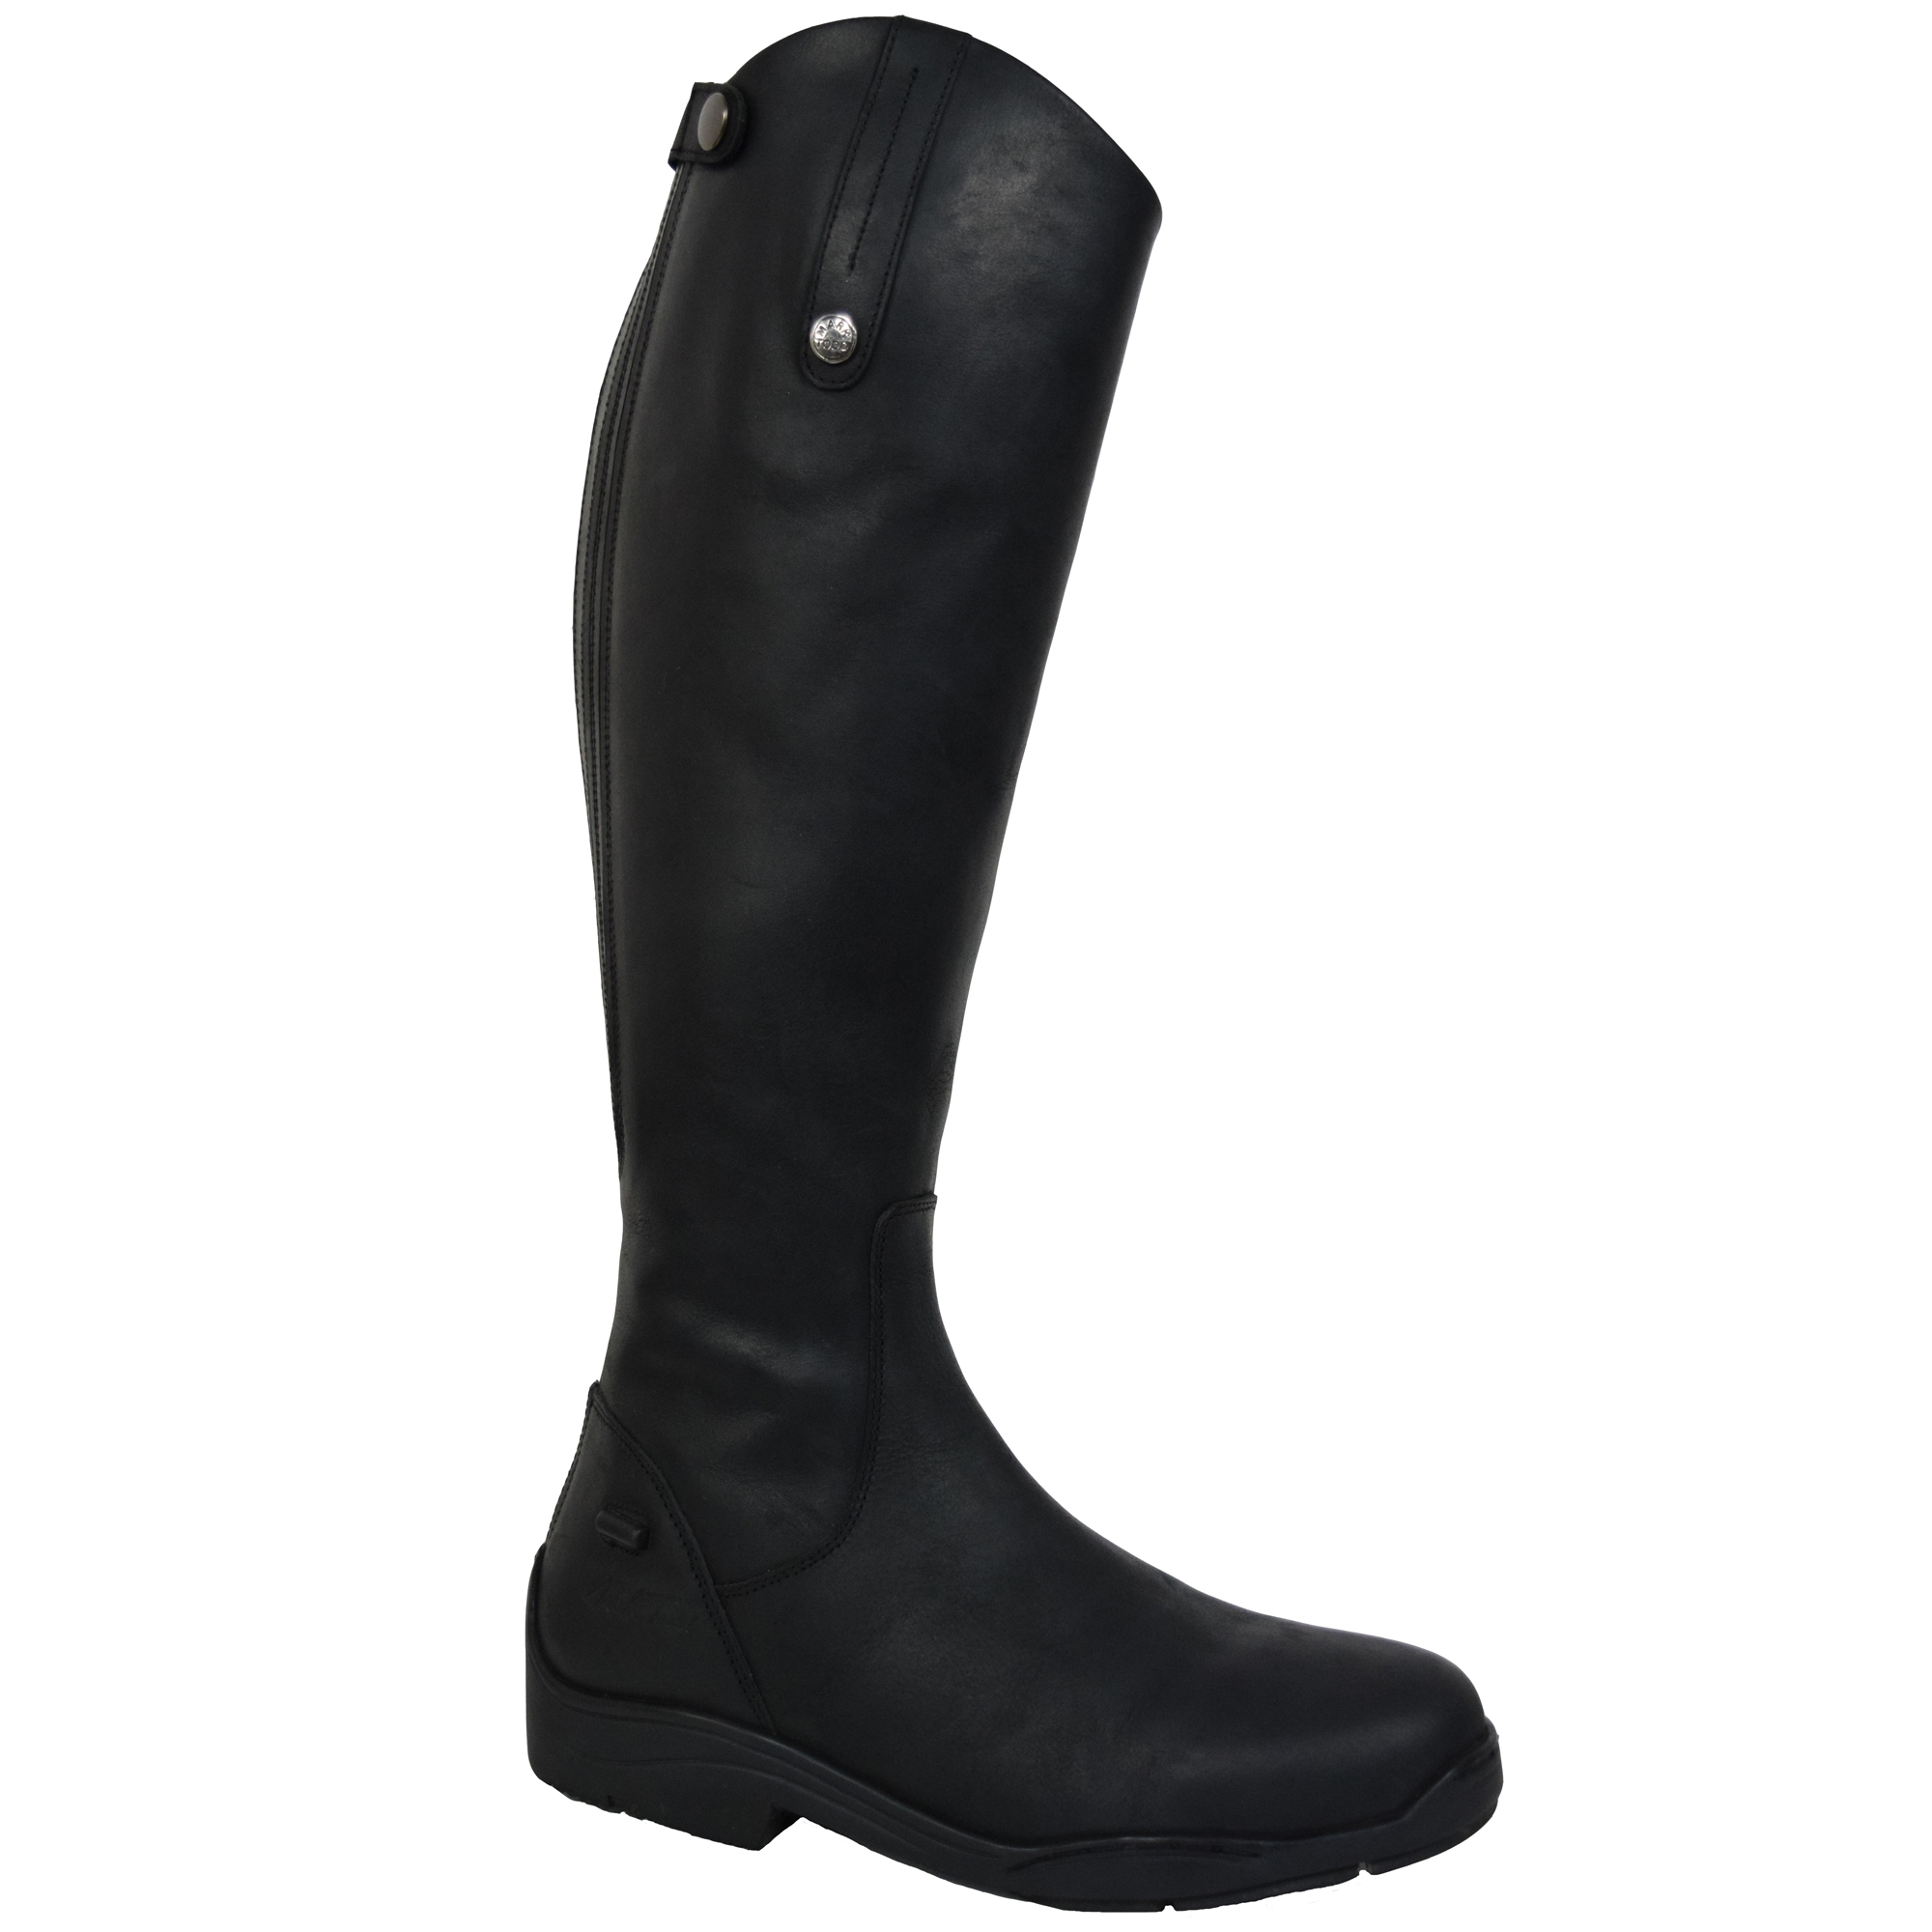 4e99d379458 Mark Todd Fleece Lined Tall Winter Boot - Equine Mania